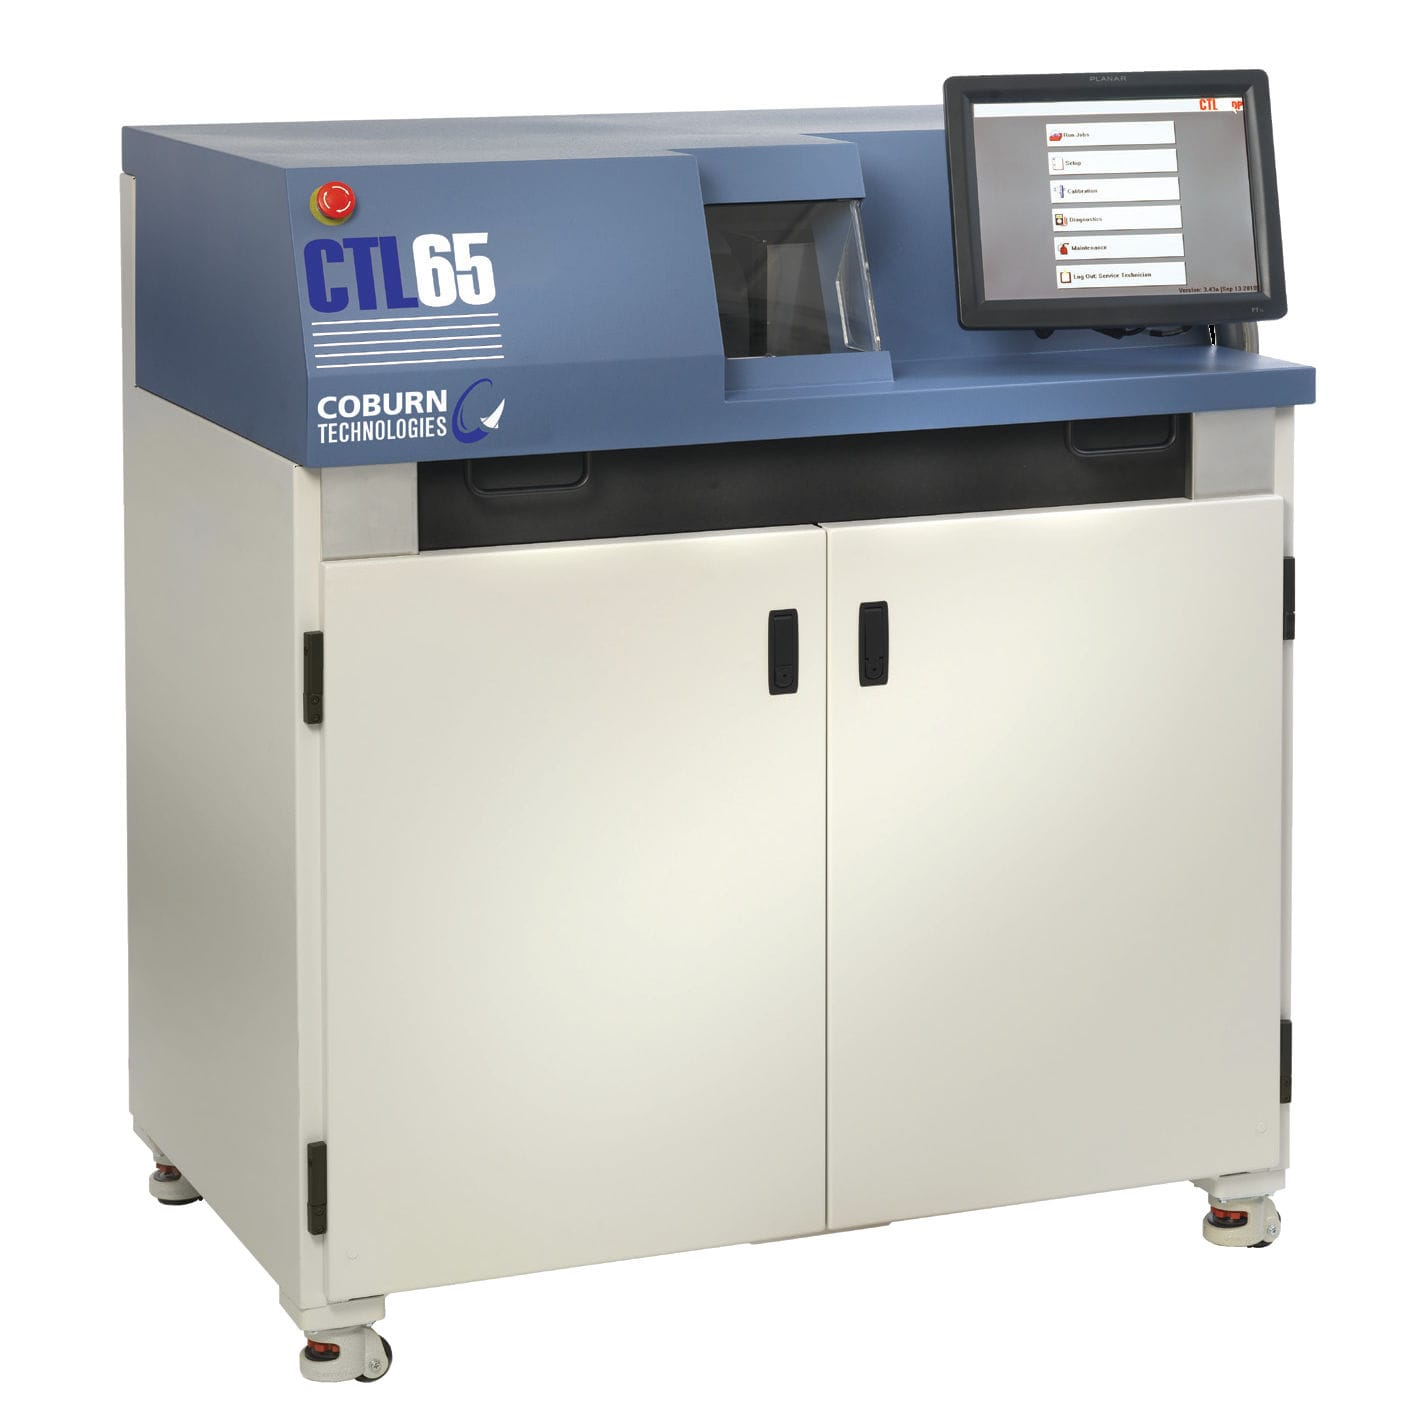 manual surfacing generator for ophthalmic lens production ctl65 rh directindustry com Manual Generator Transfer Switch Wiring Older Onan Generator Manuals